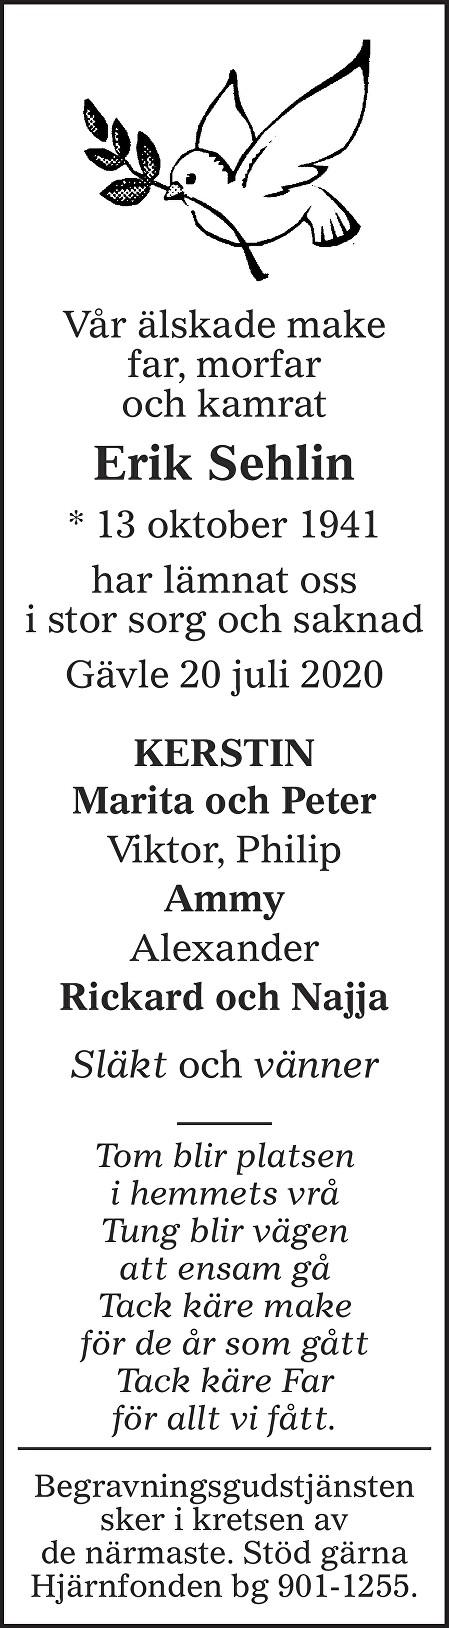 Erik Sehlin Death notice